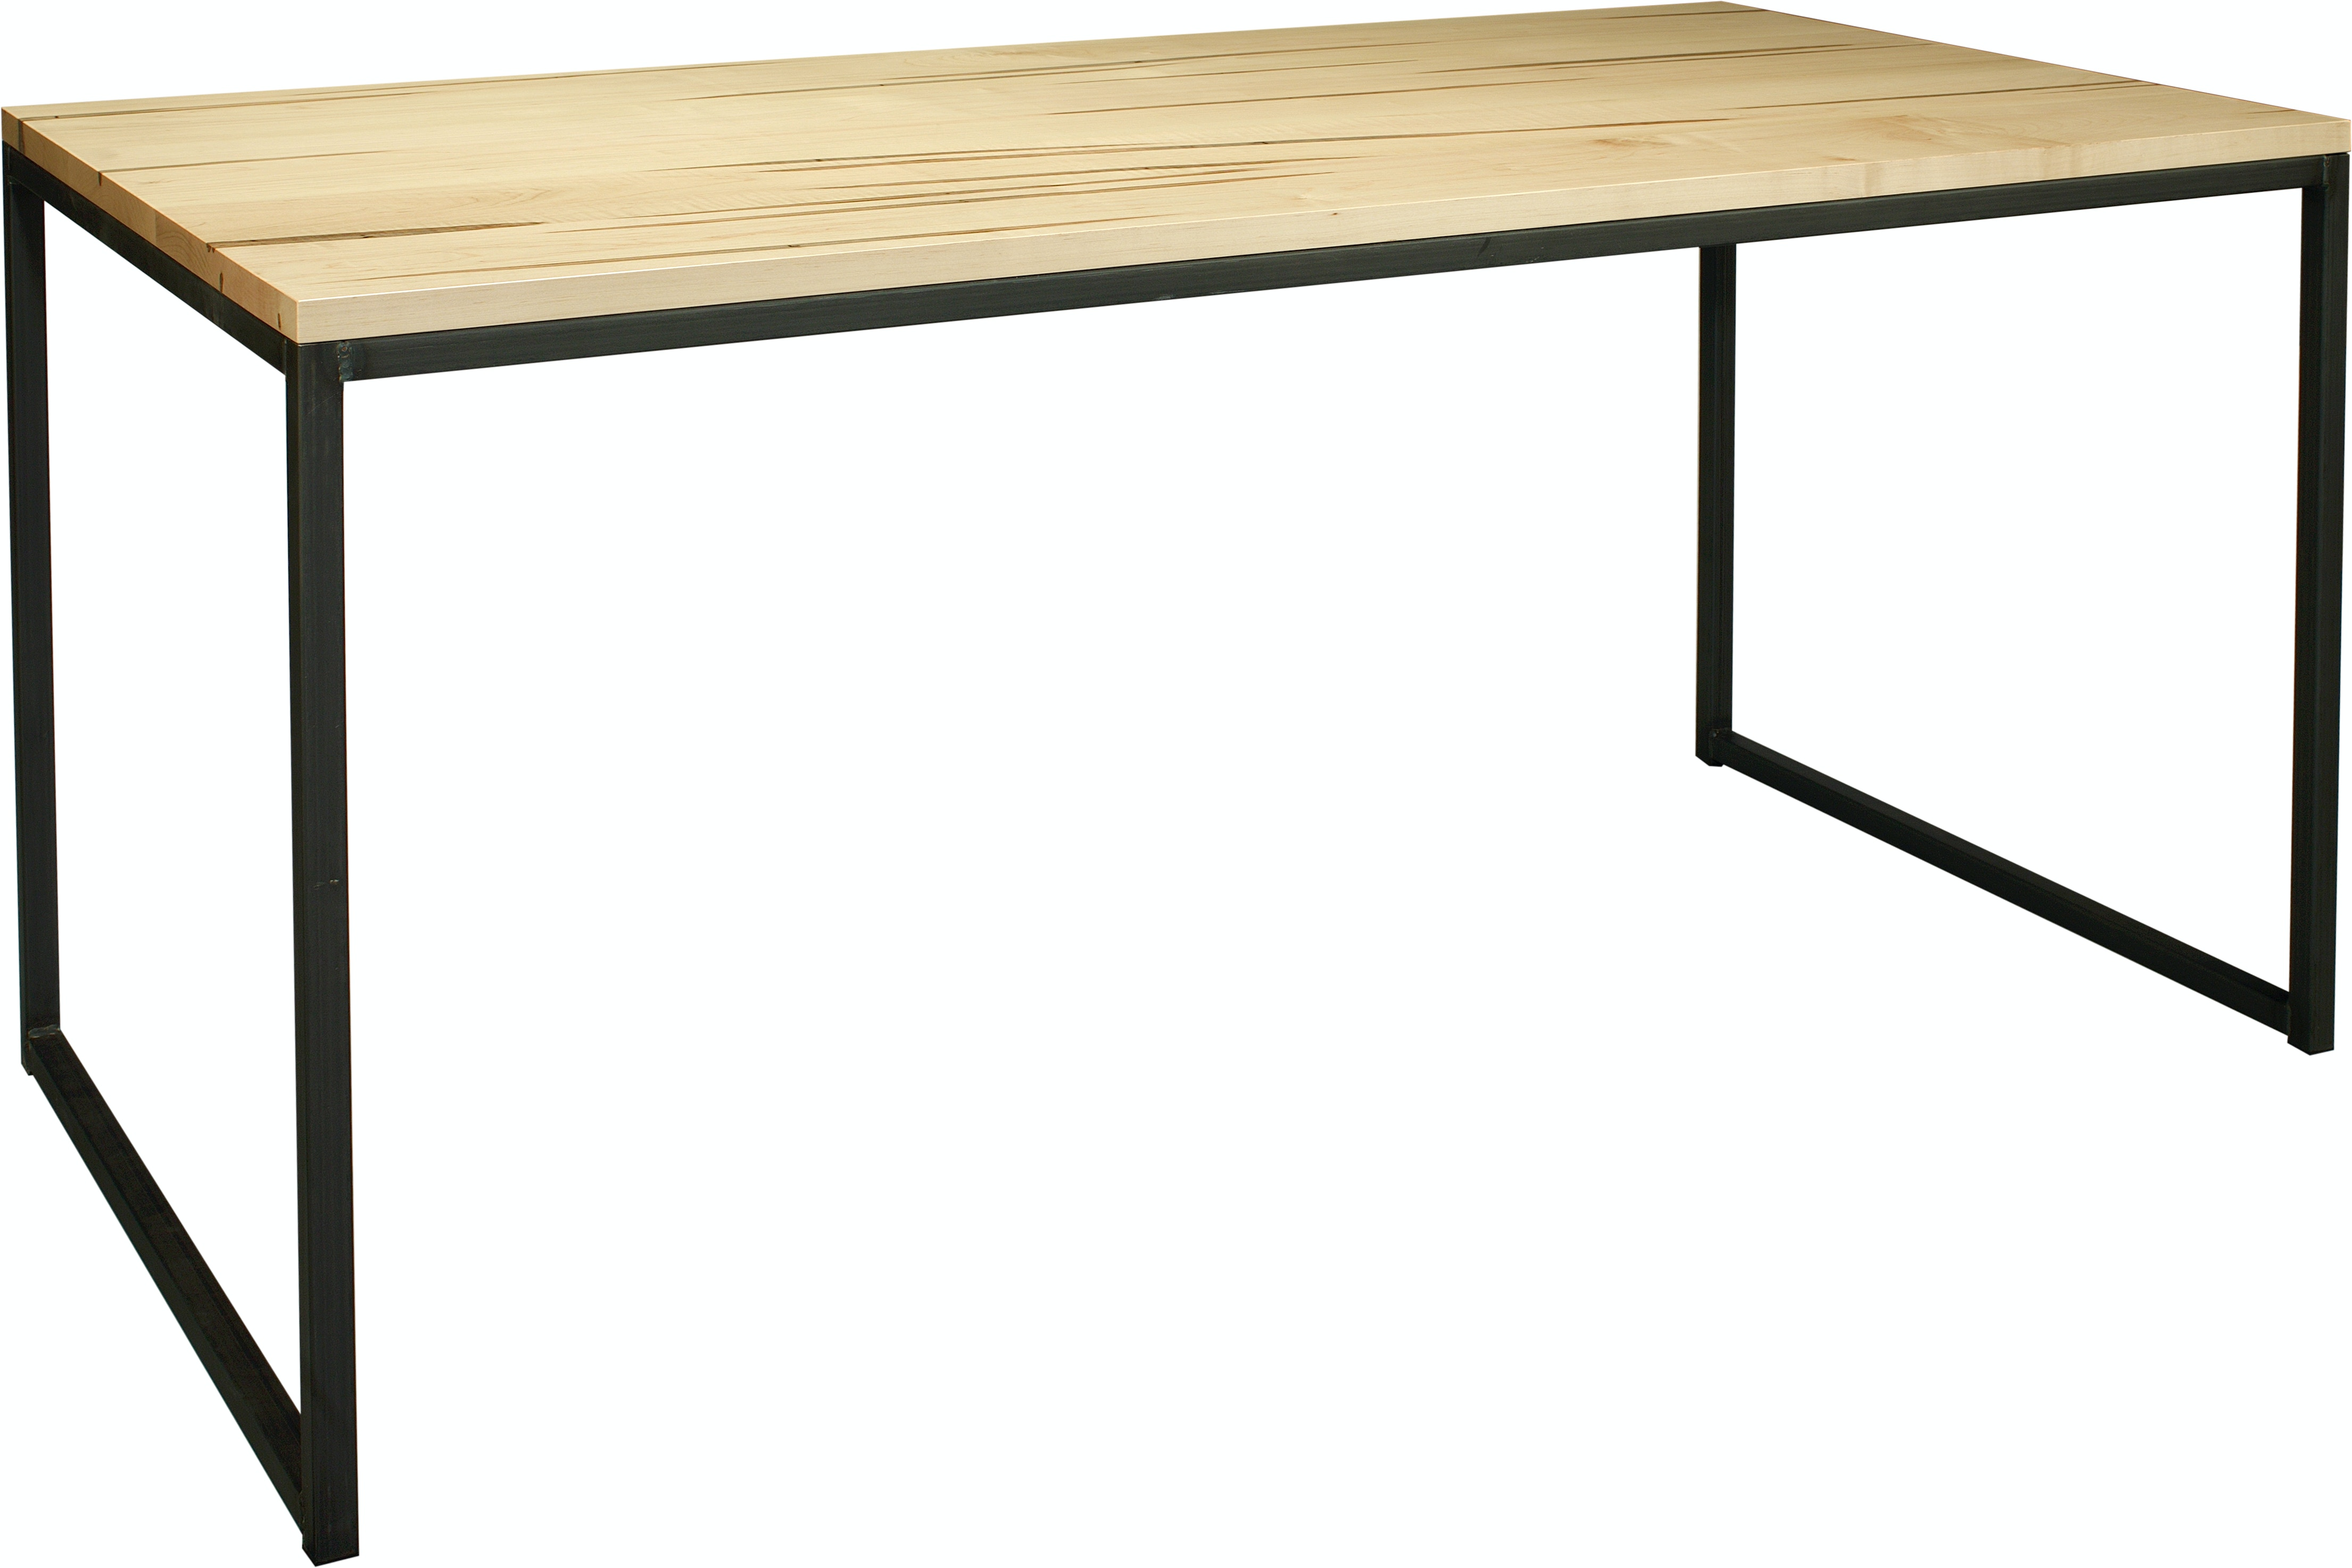 Barkman Home Office Omniand River Desk 6000 0101D 60 At High Country  Furniture U0026 Design